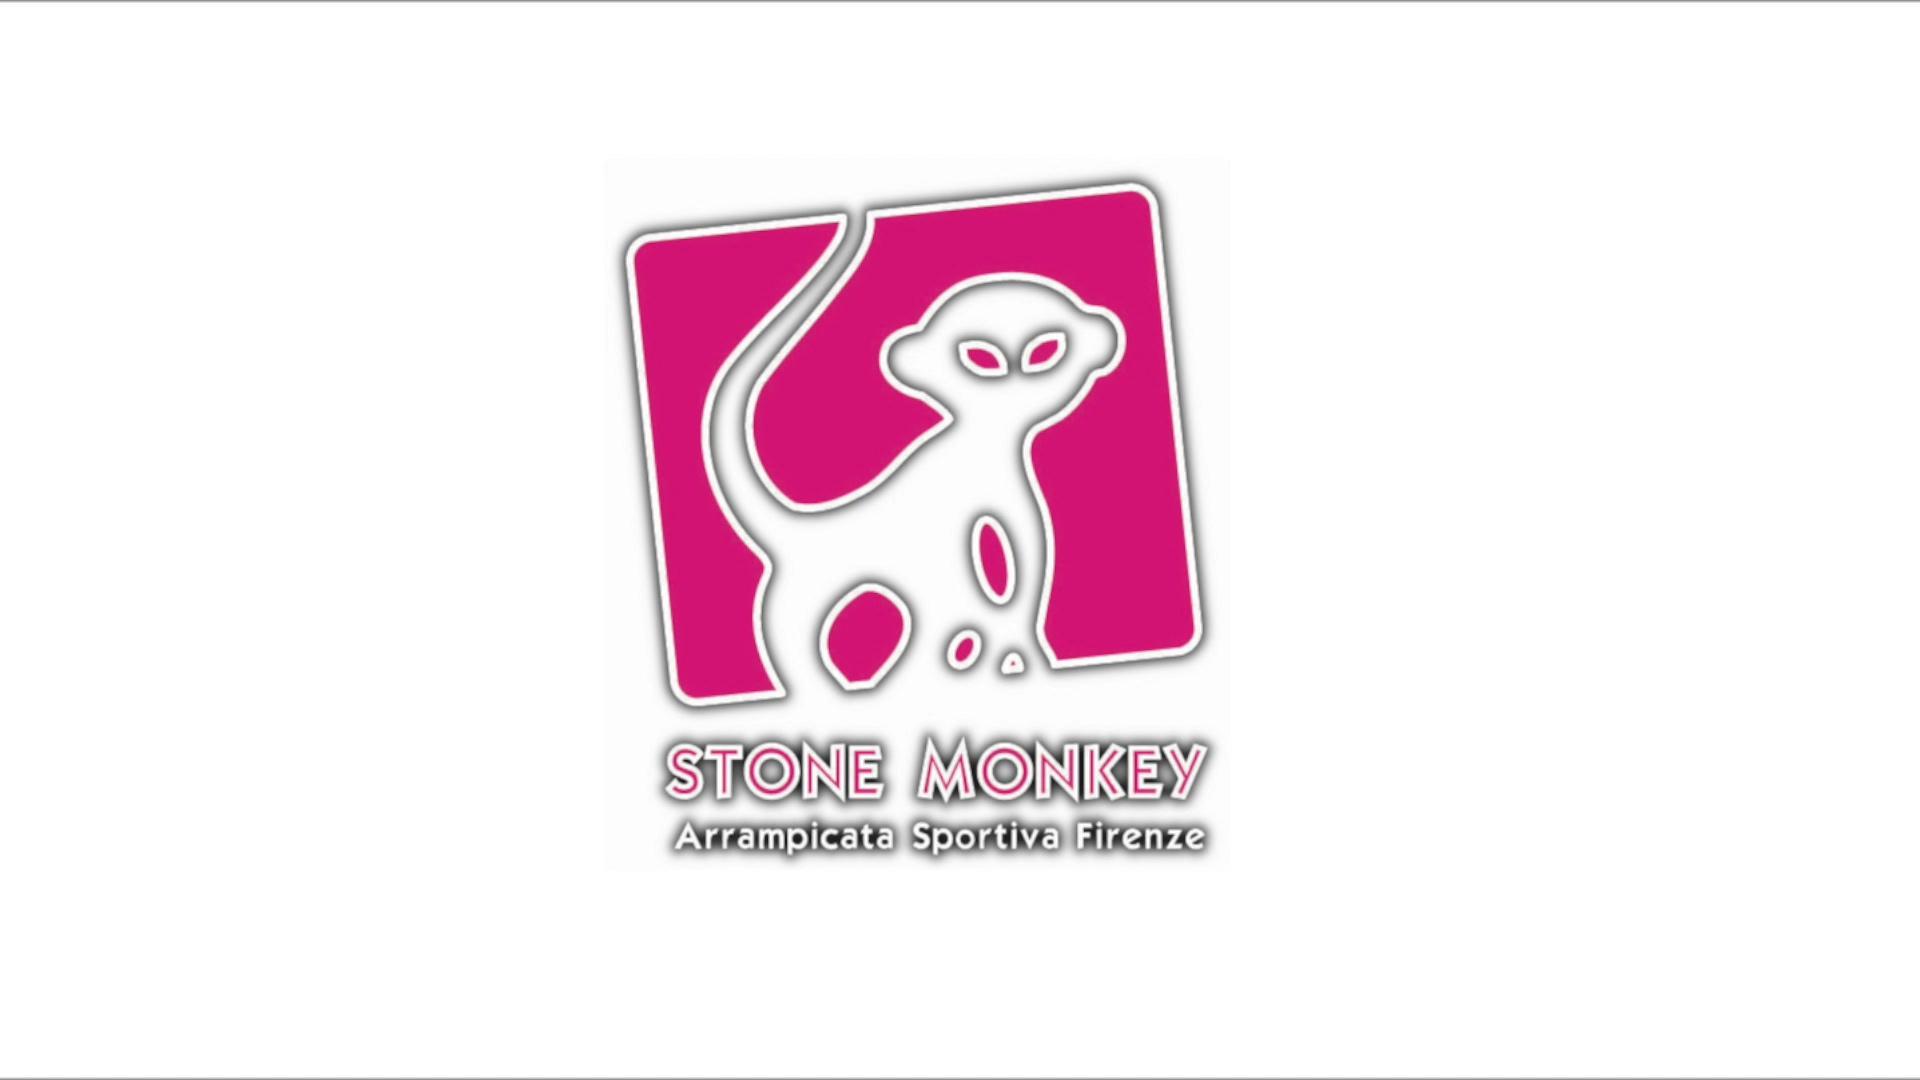 Stone Monkey Arrampicata Sportiva